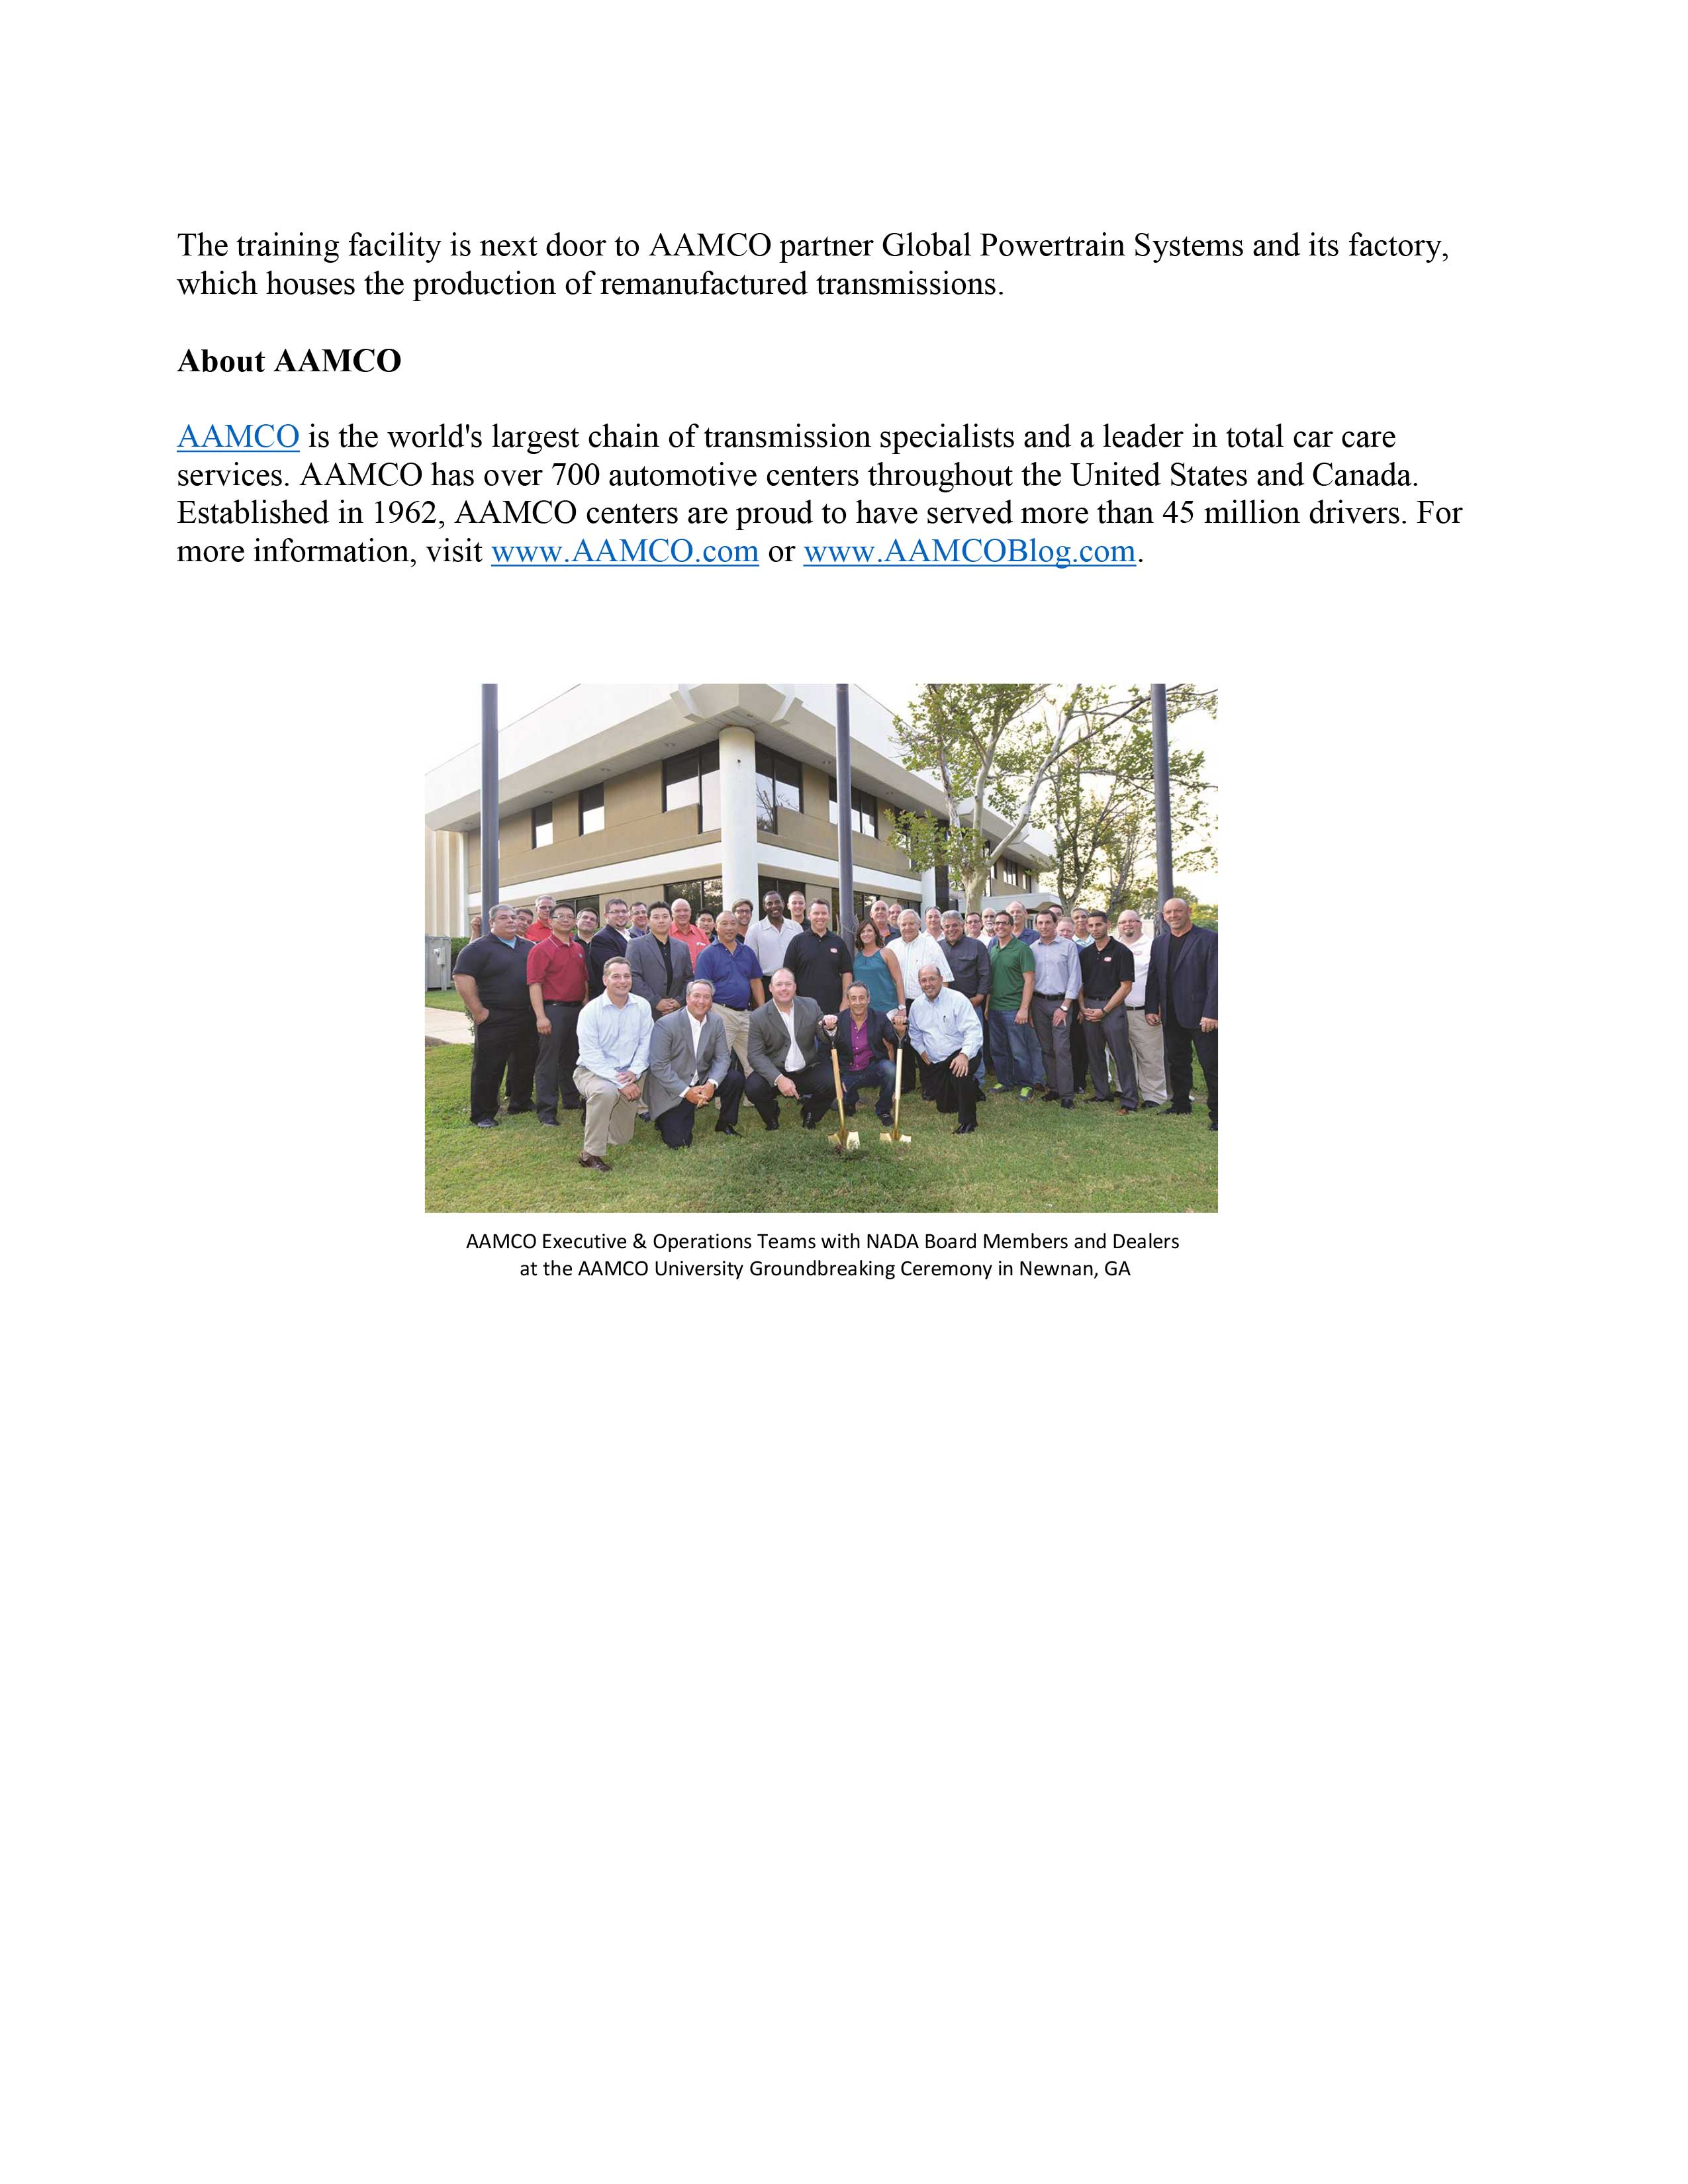 AAMCO University Press Release